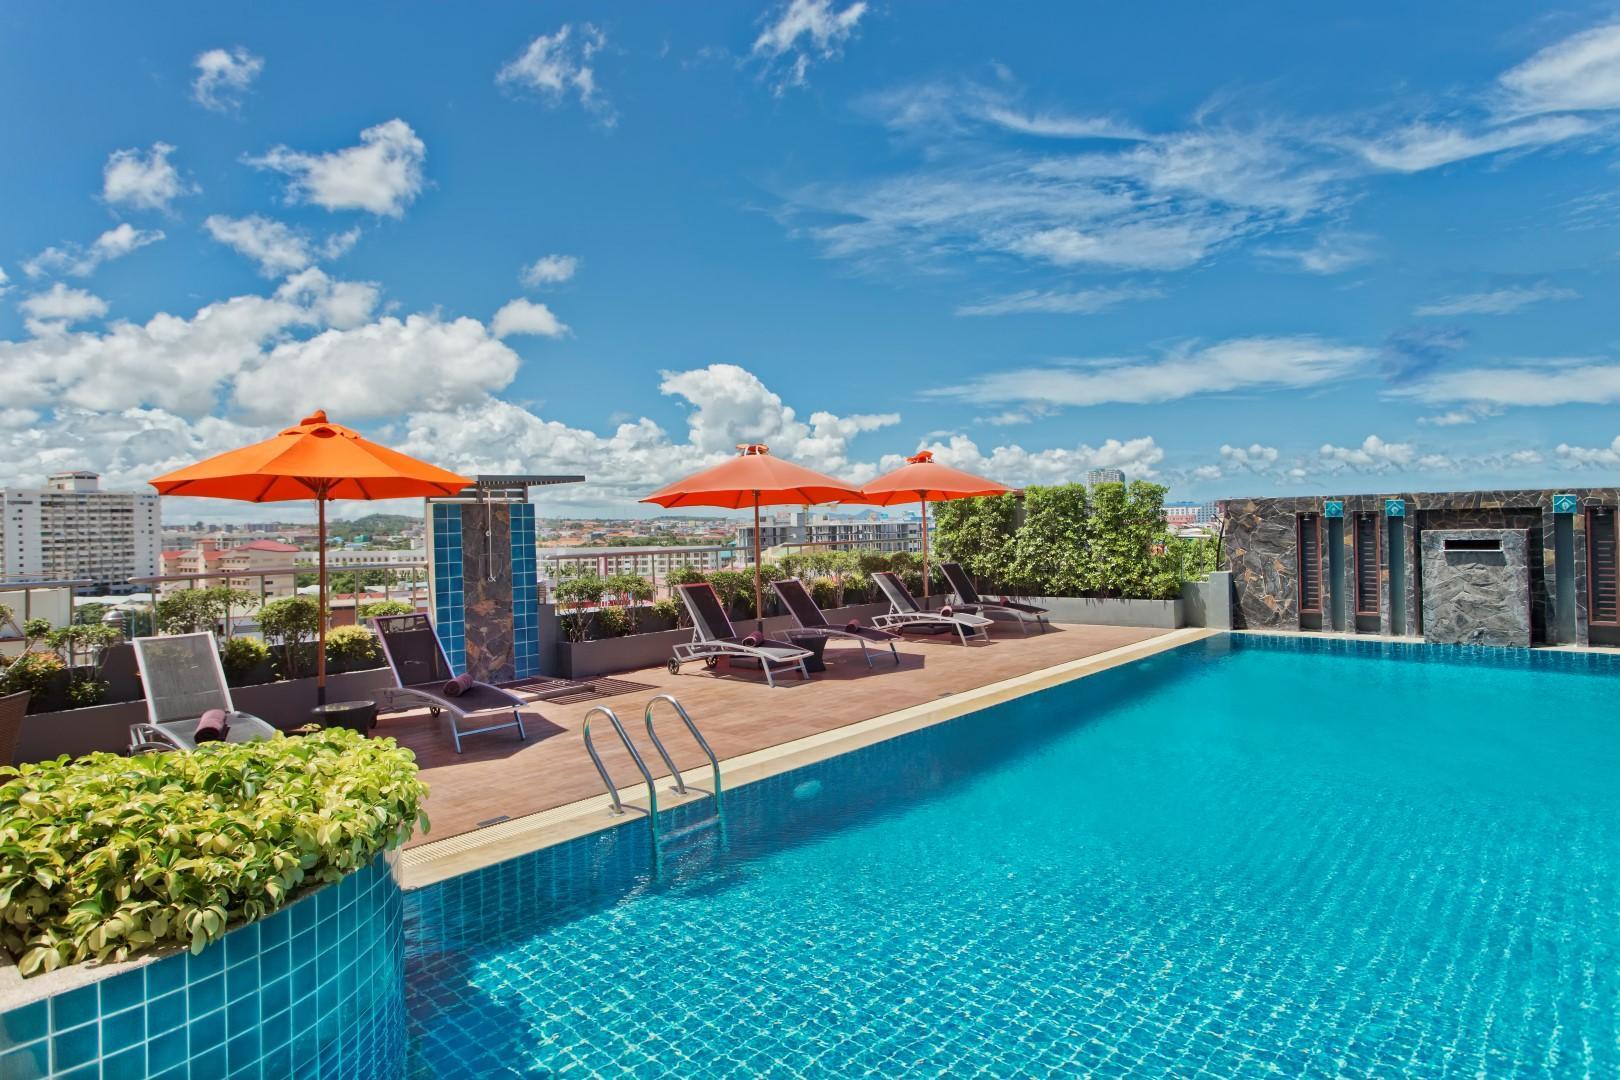 Adelphi Pattaya Hotel โรงแรมอเดลฟี พัทยา